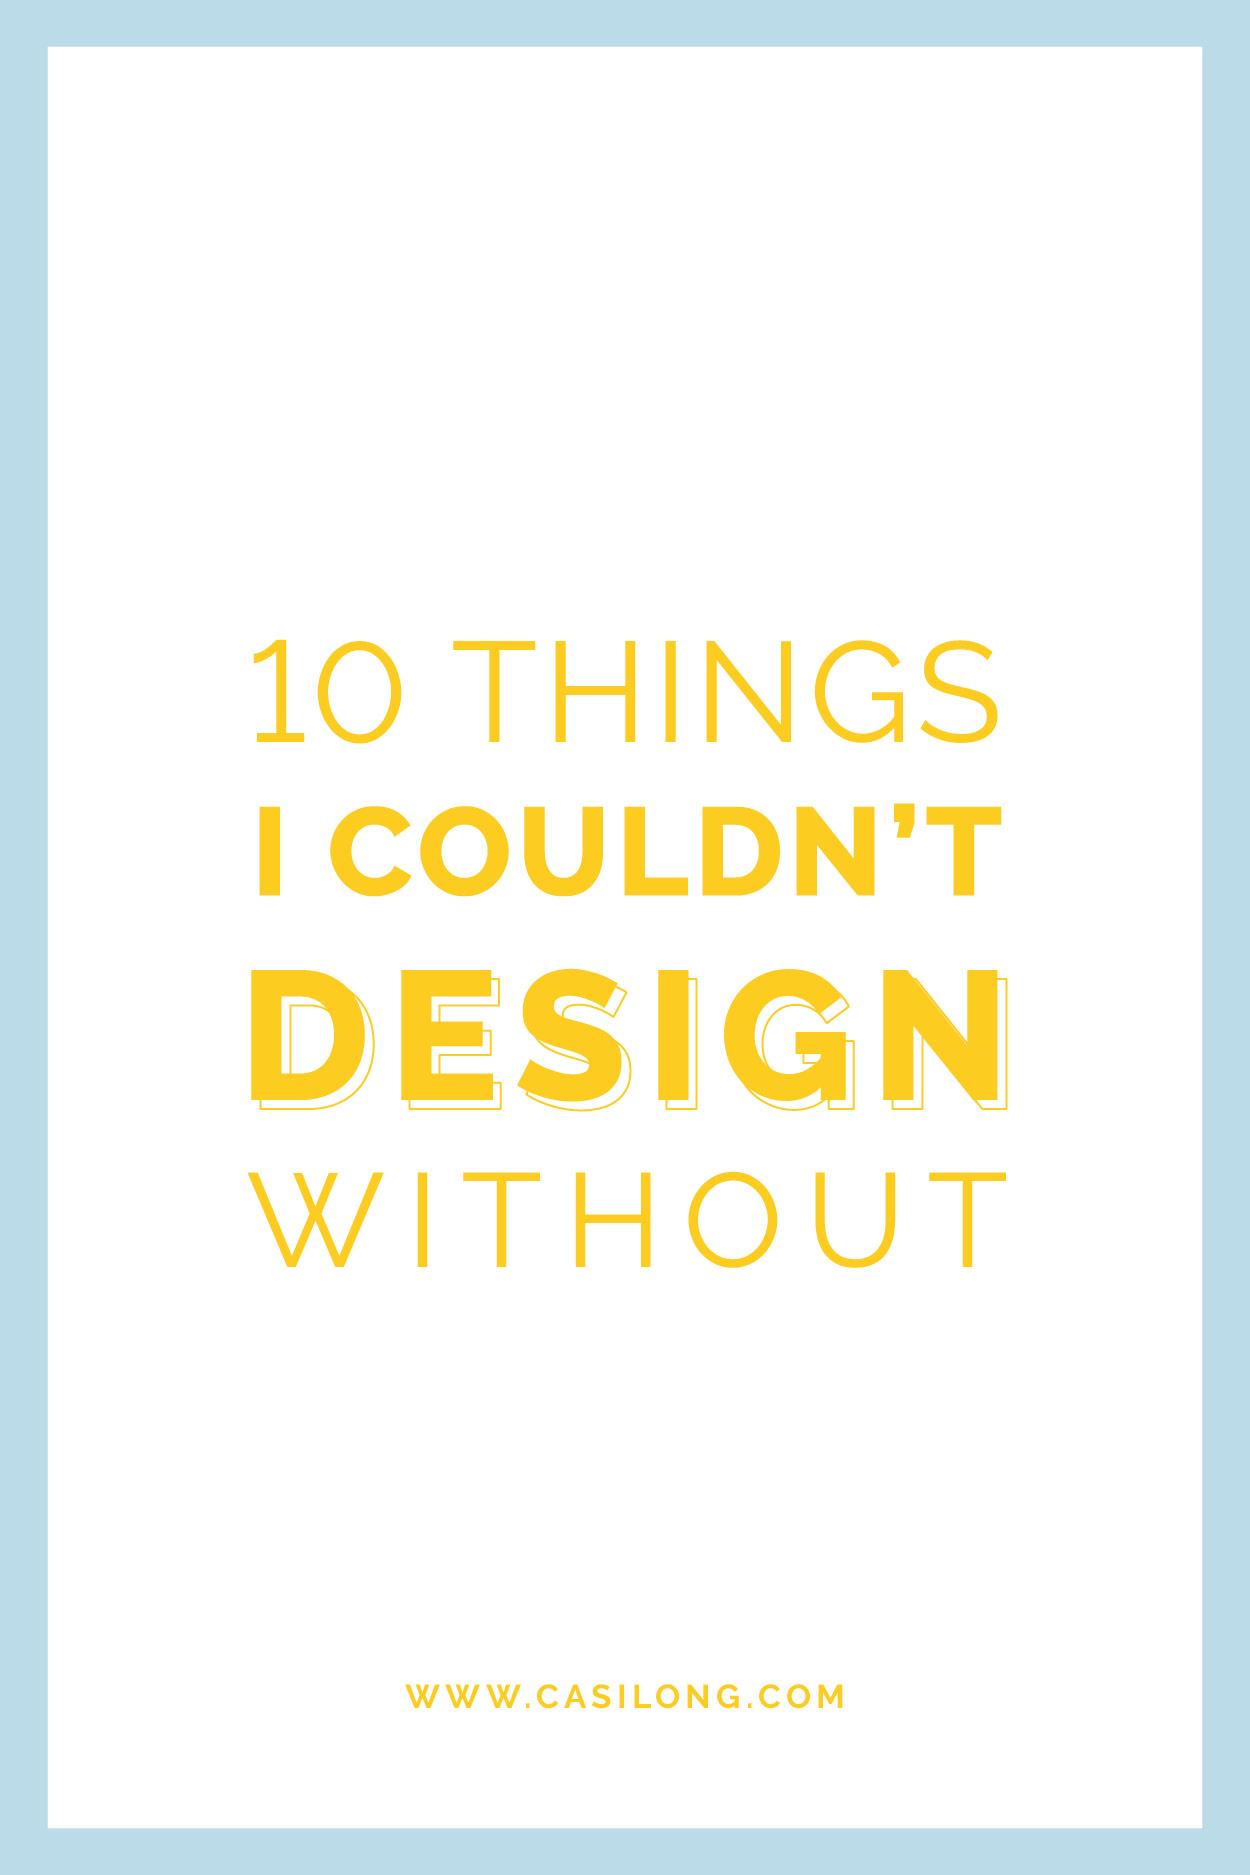 10 Things I Couldn't Design Without | casilong.com/blog | #casilongdesign #fearlesspursuit